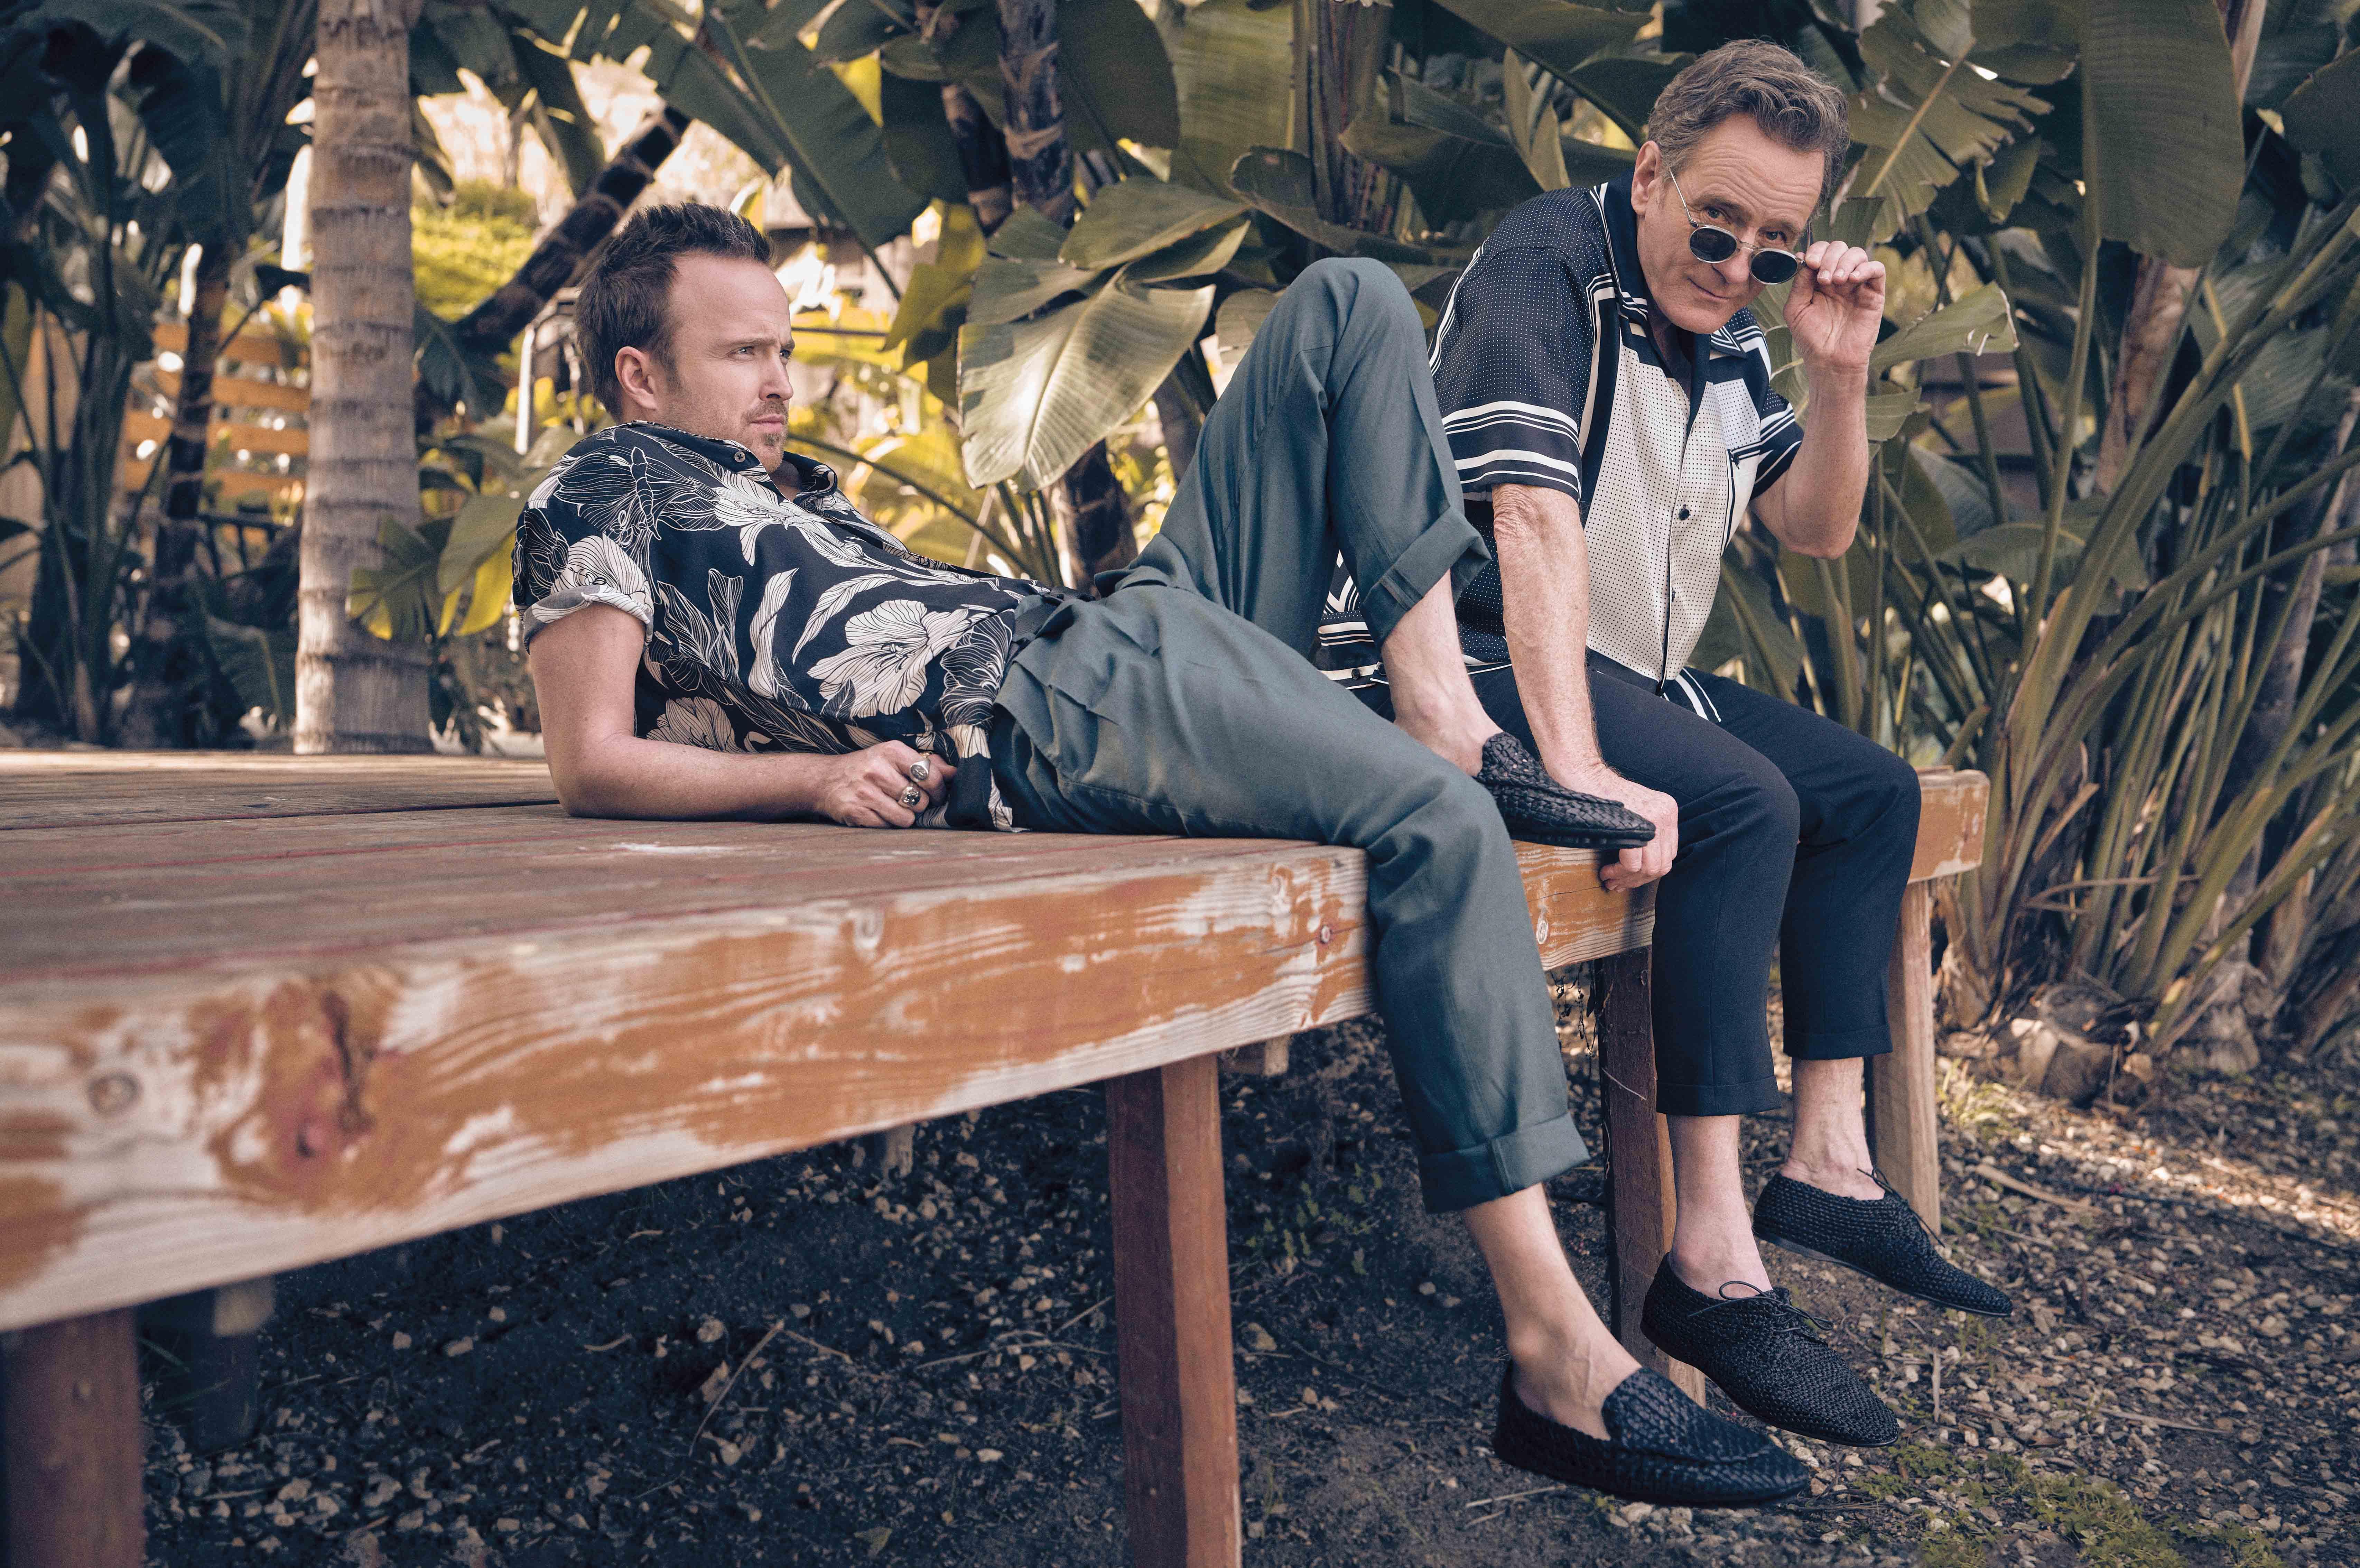 На Аароне:рубашка AllSaints; брюки илоферыDolce & Gabbana; перстни David Yurman.На Брайане:рубашка идерби Dolce & Gabbana; брюки AllSaints; очки Oliver Peoples